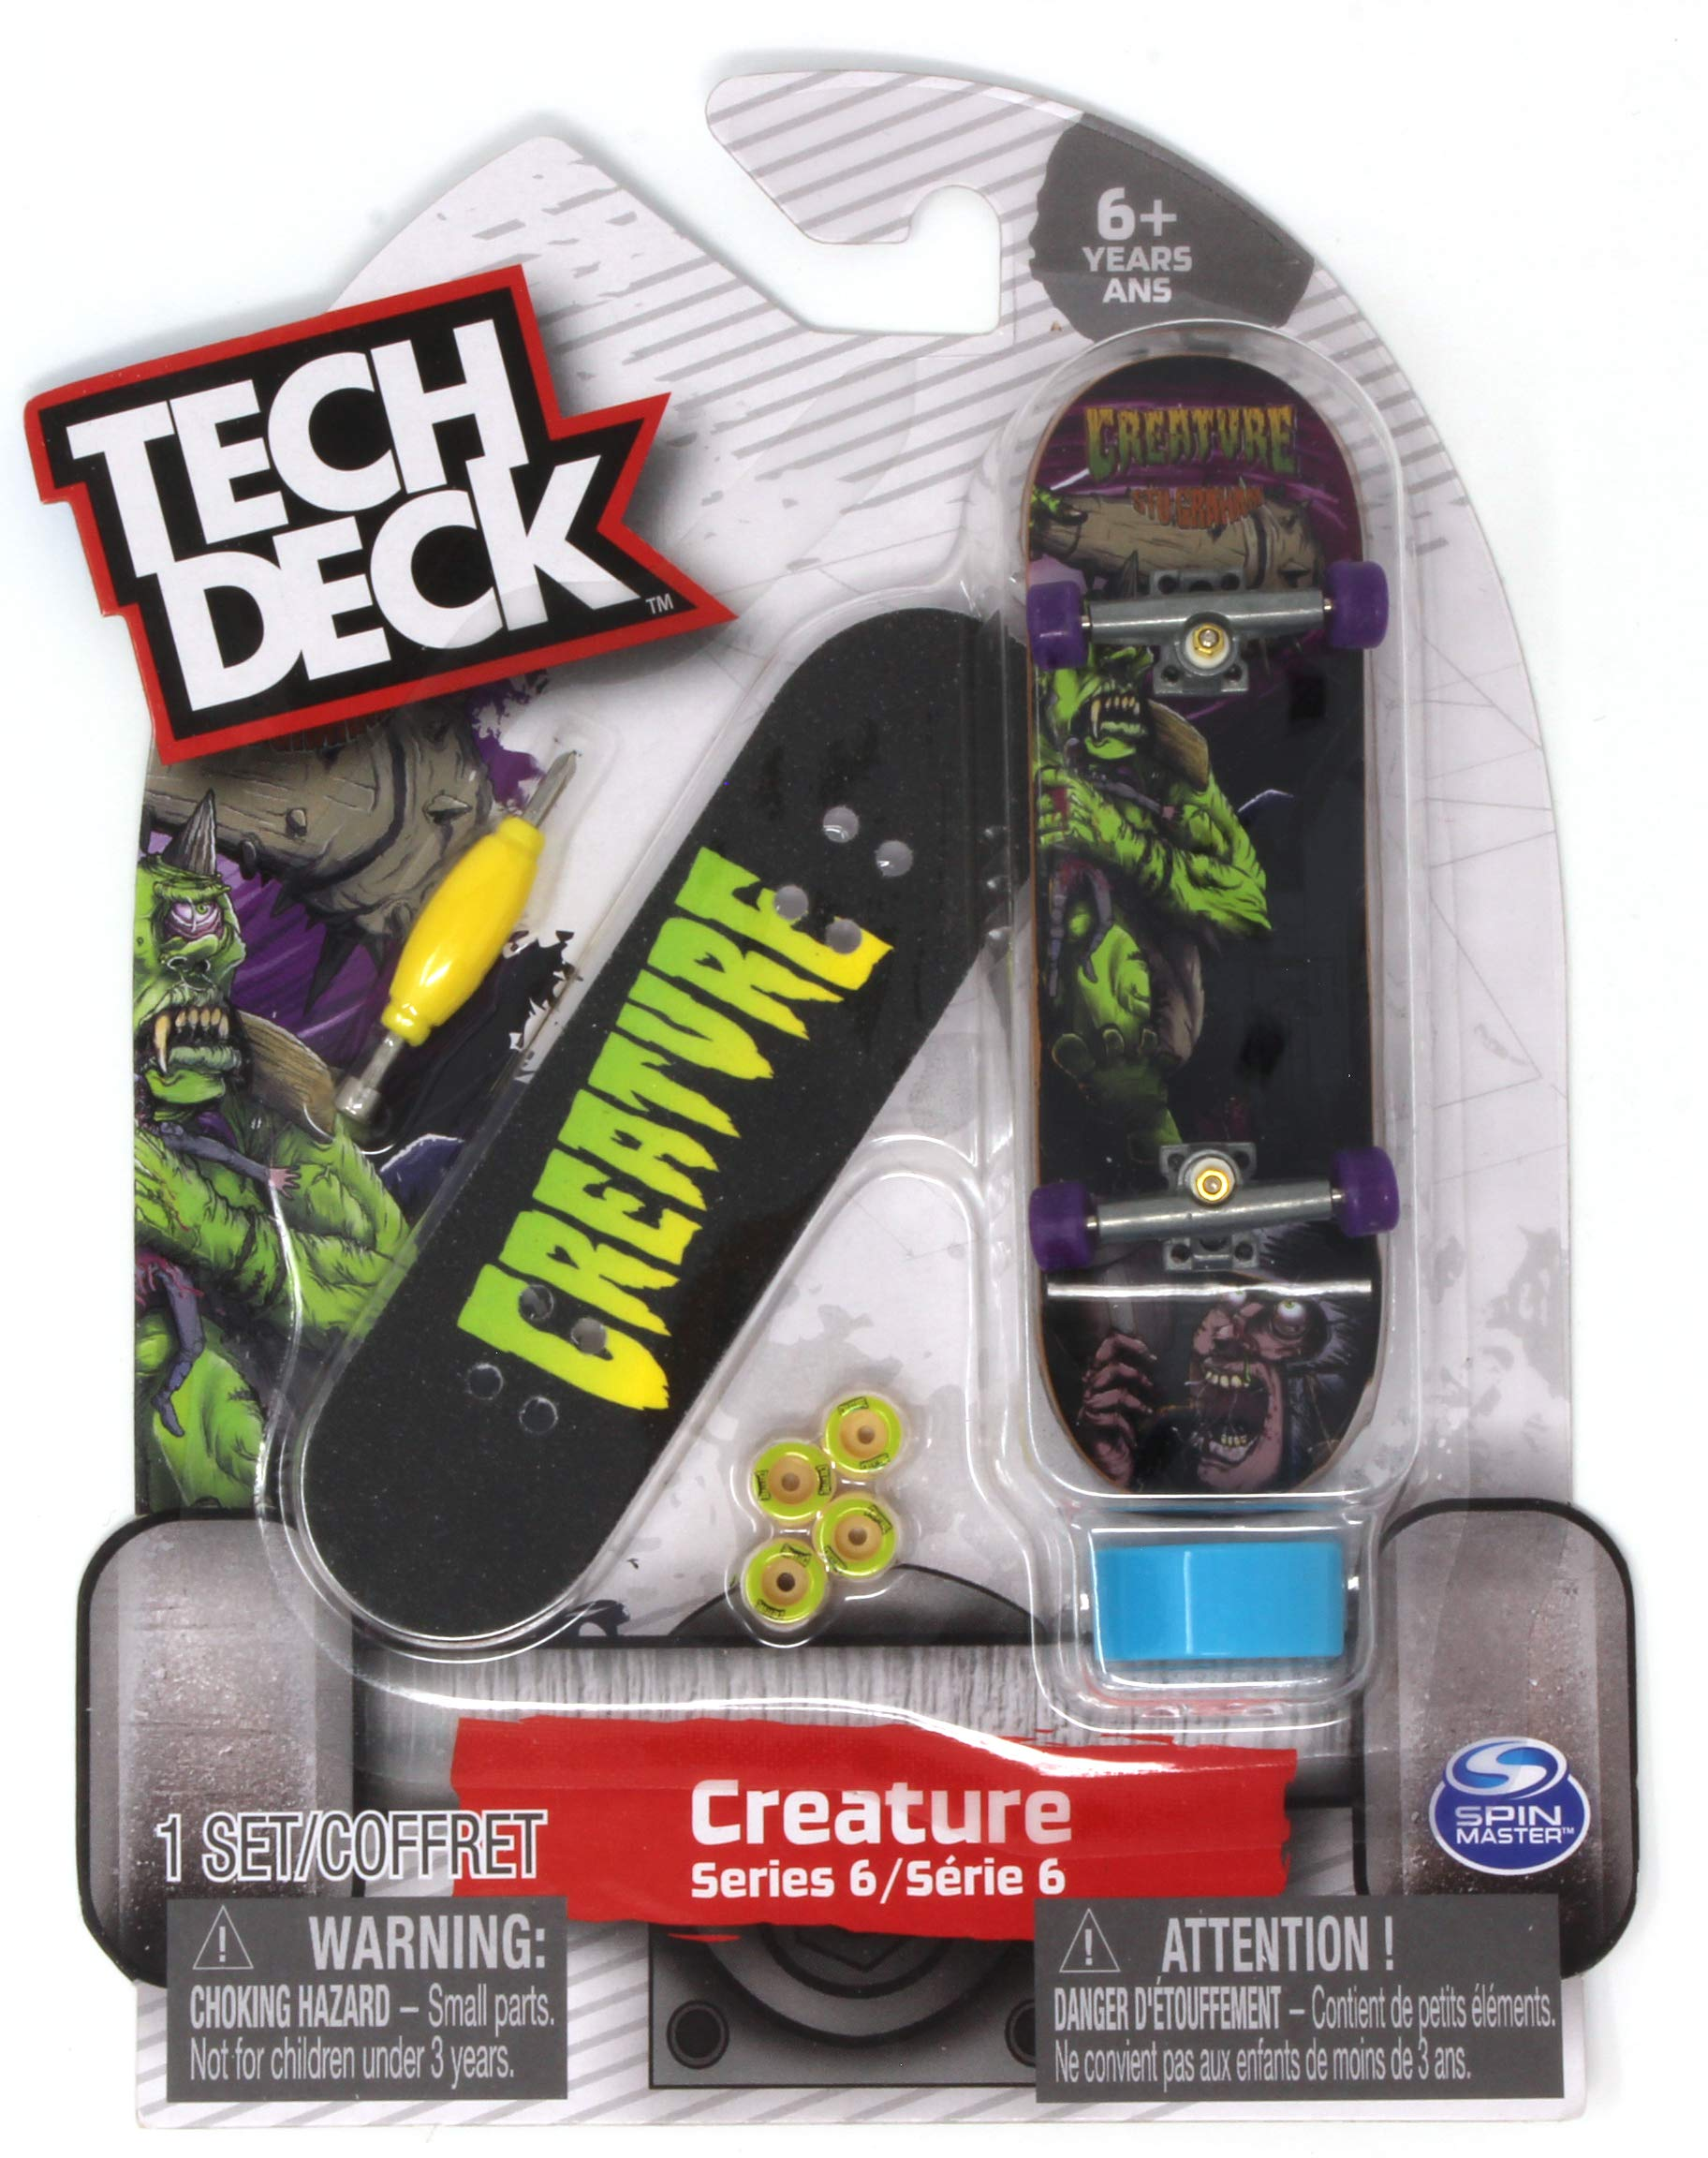 Tech Deck Creature Skateboards Rare Series 6 STU Graham Ogre Fingerboard - 20087785